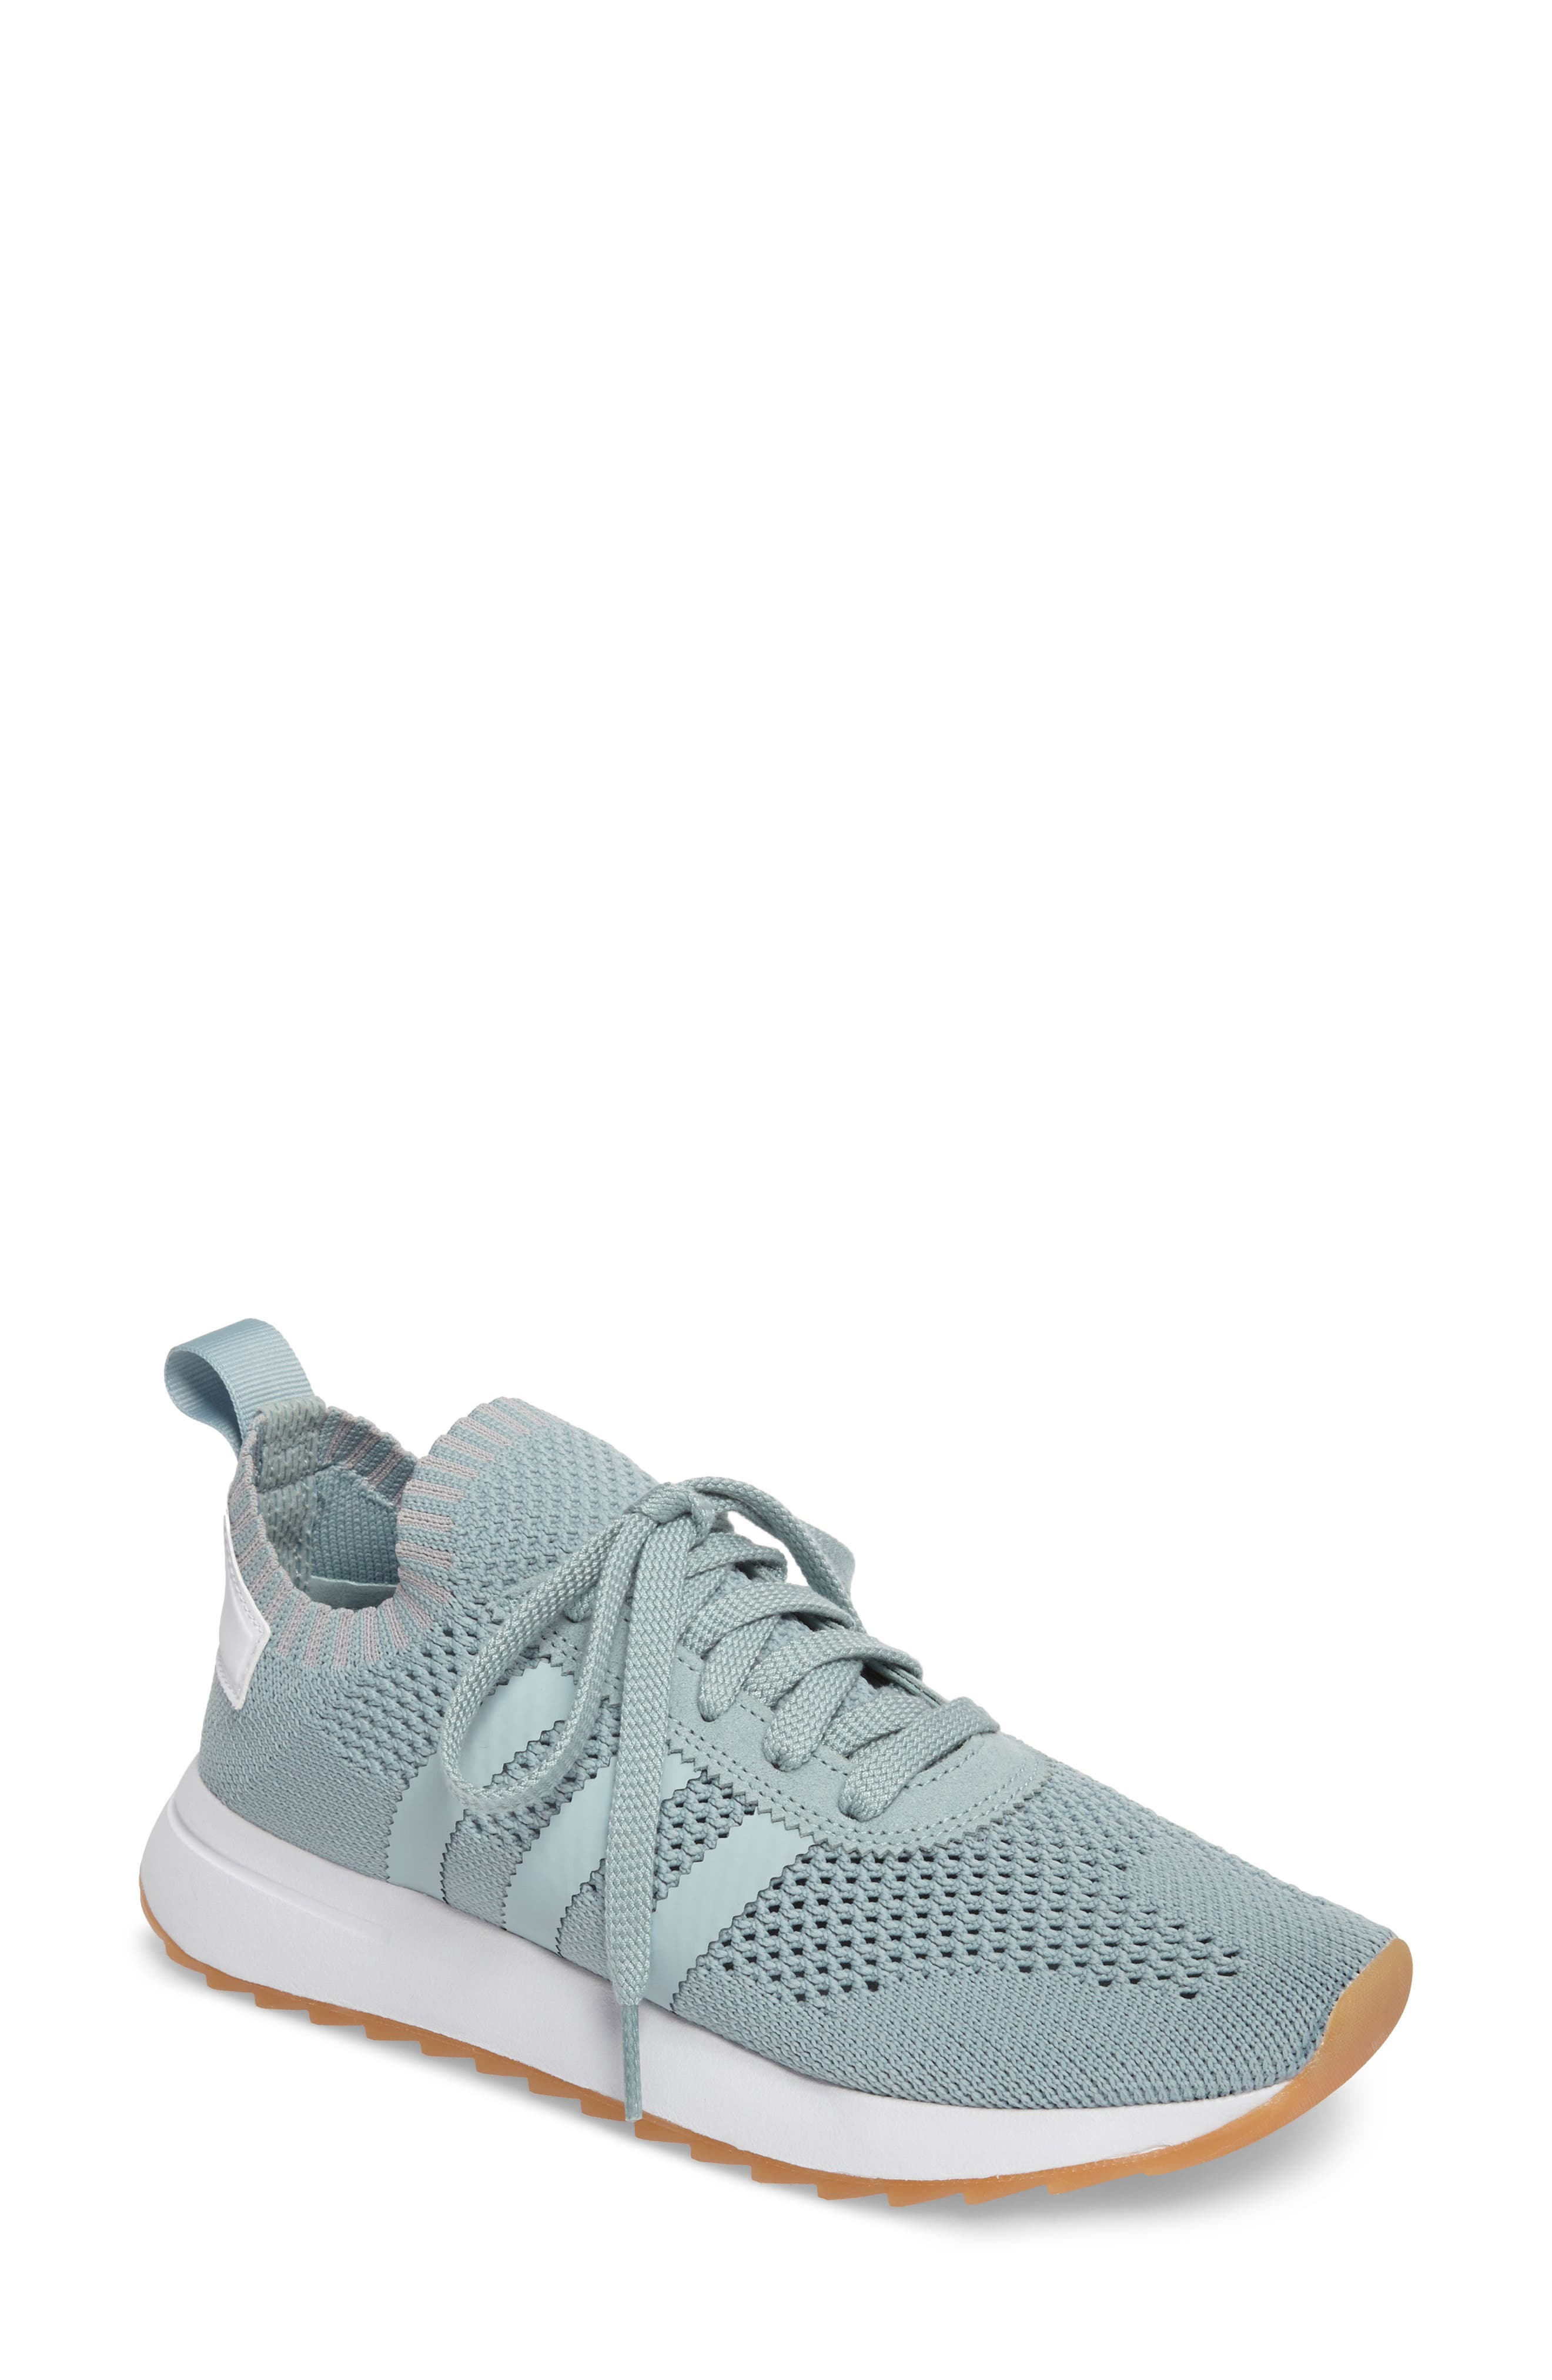 adidas Flashback Primeknit Sneaker (Women)